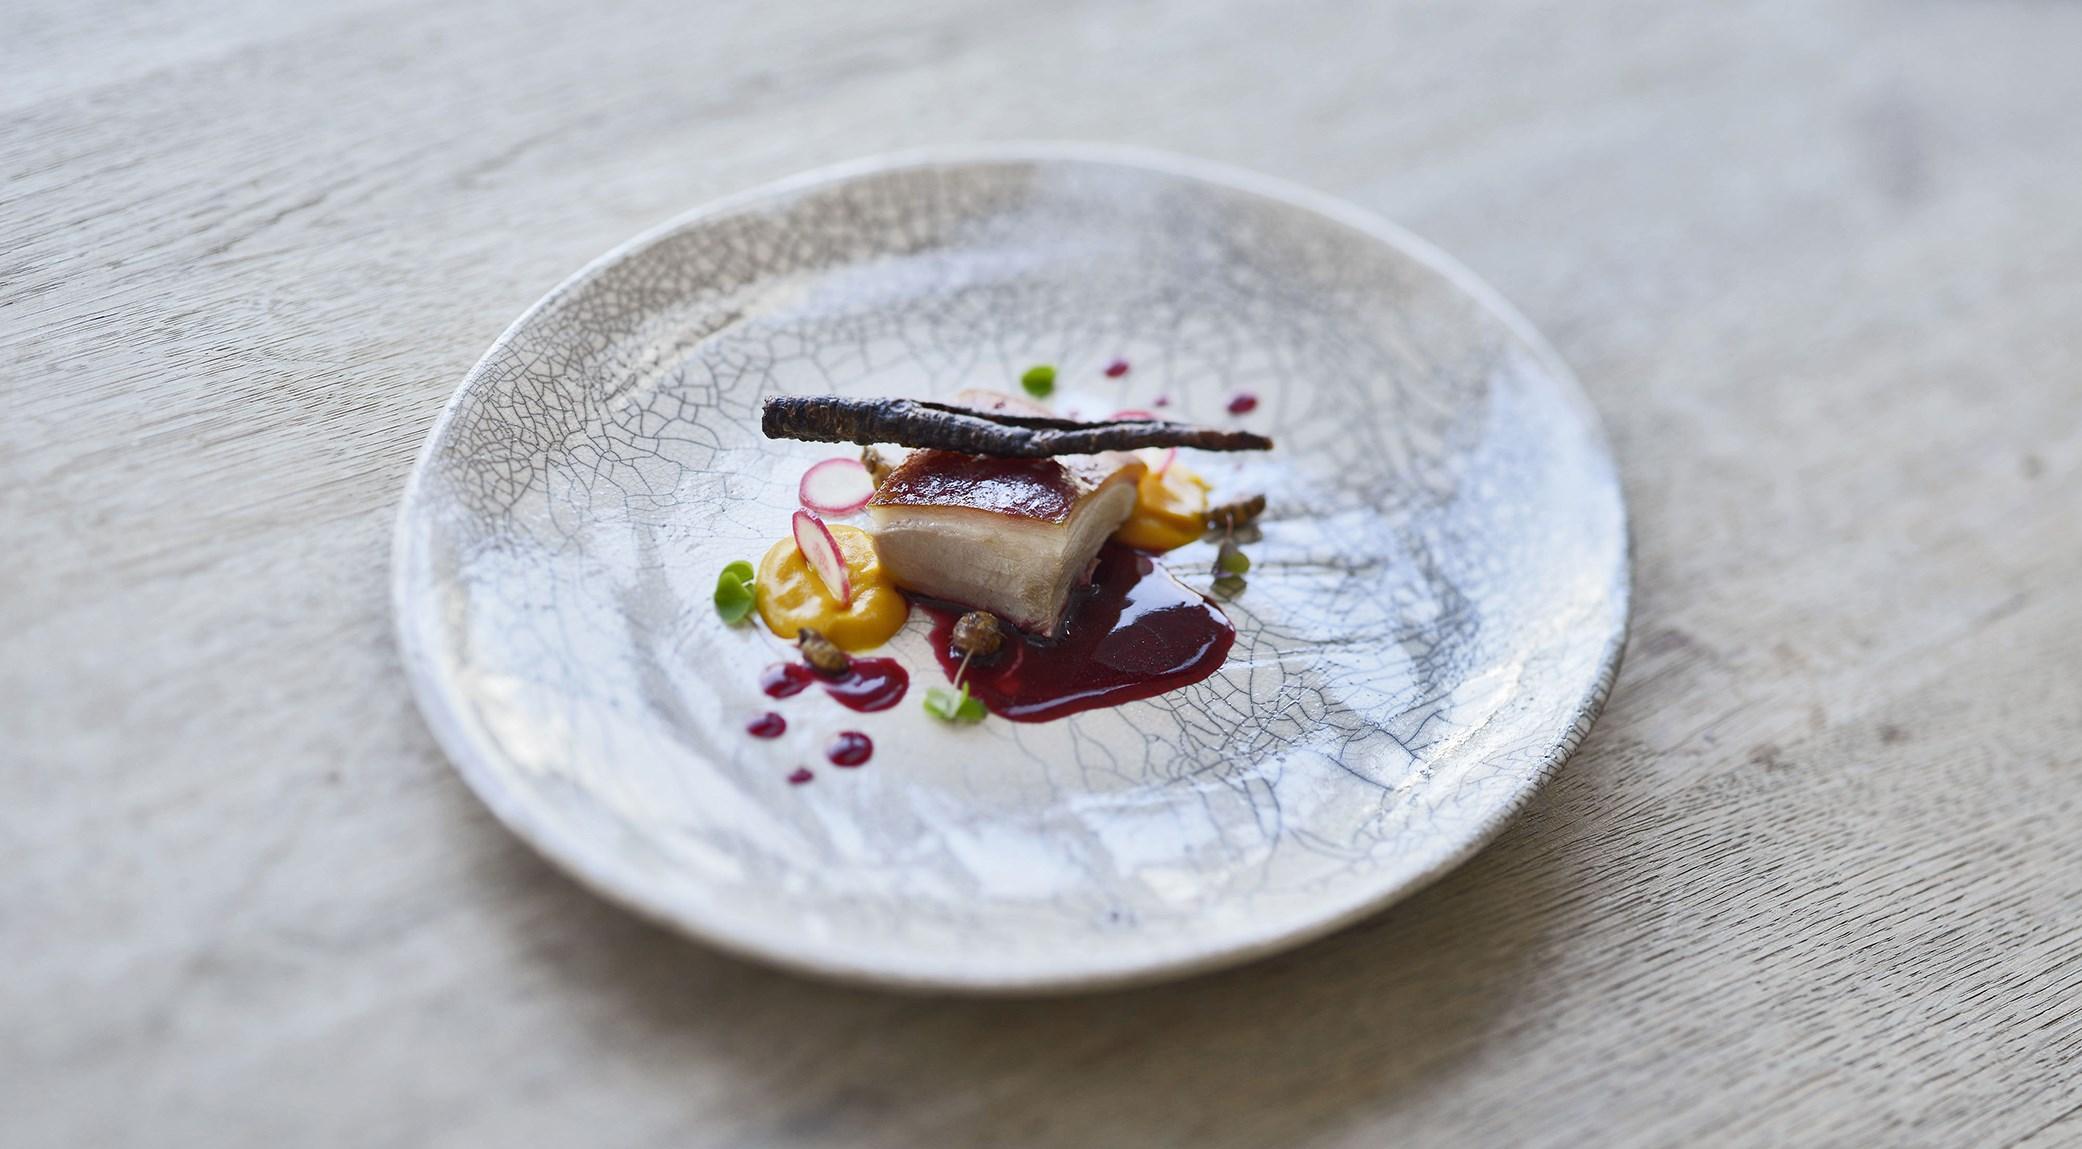 S.Pellegrino-Young-Chef-2016--Gianluca-Monni-Recipe